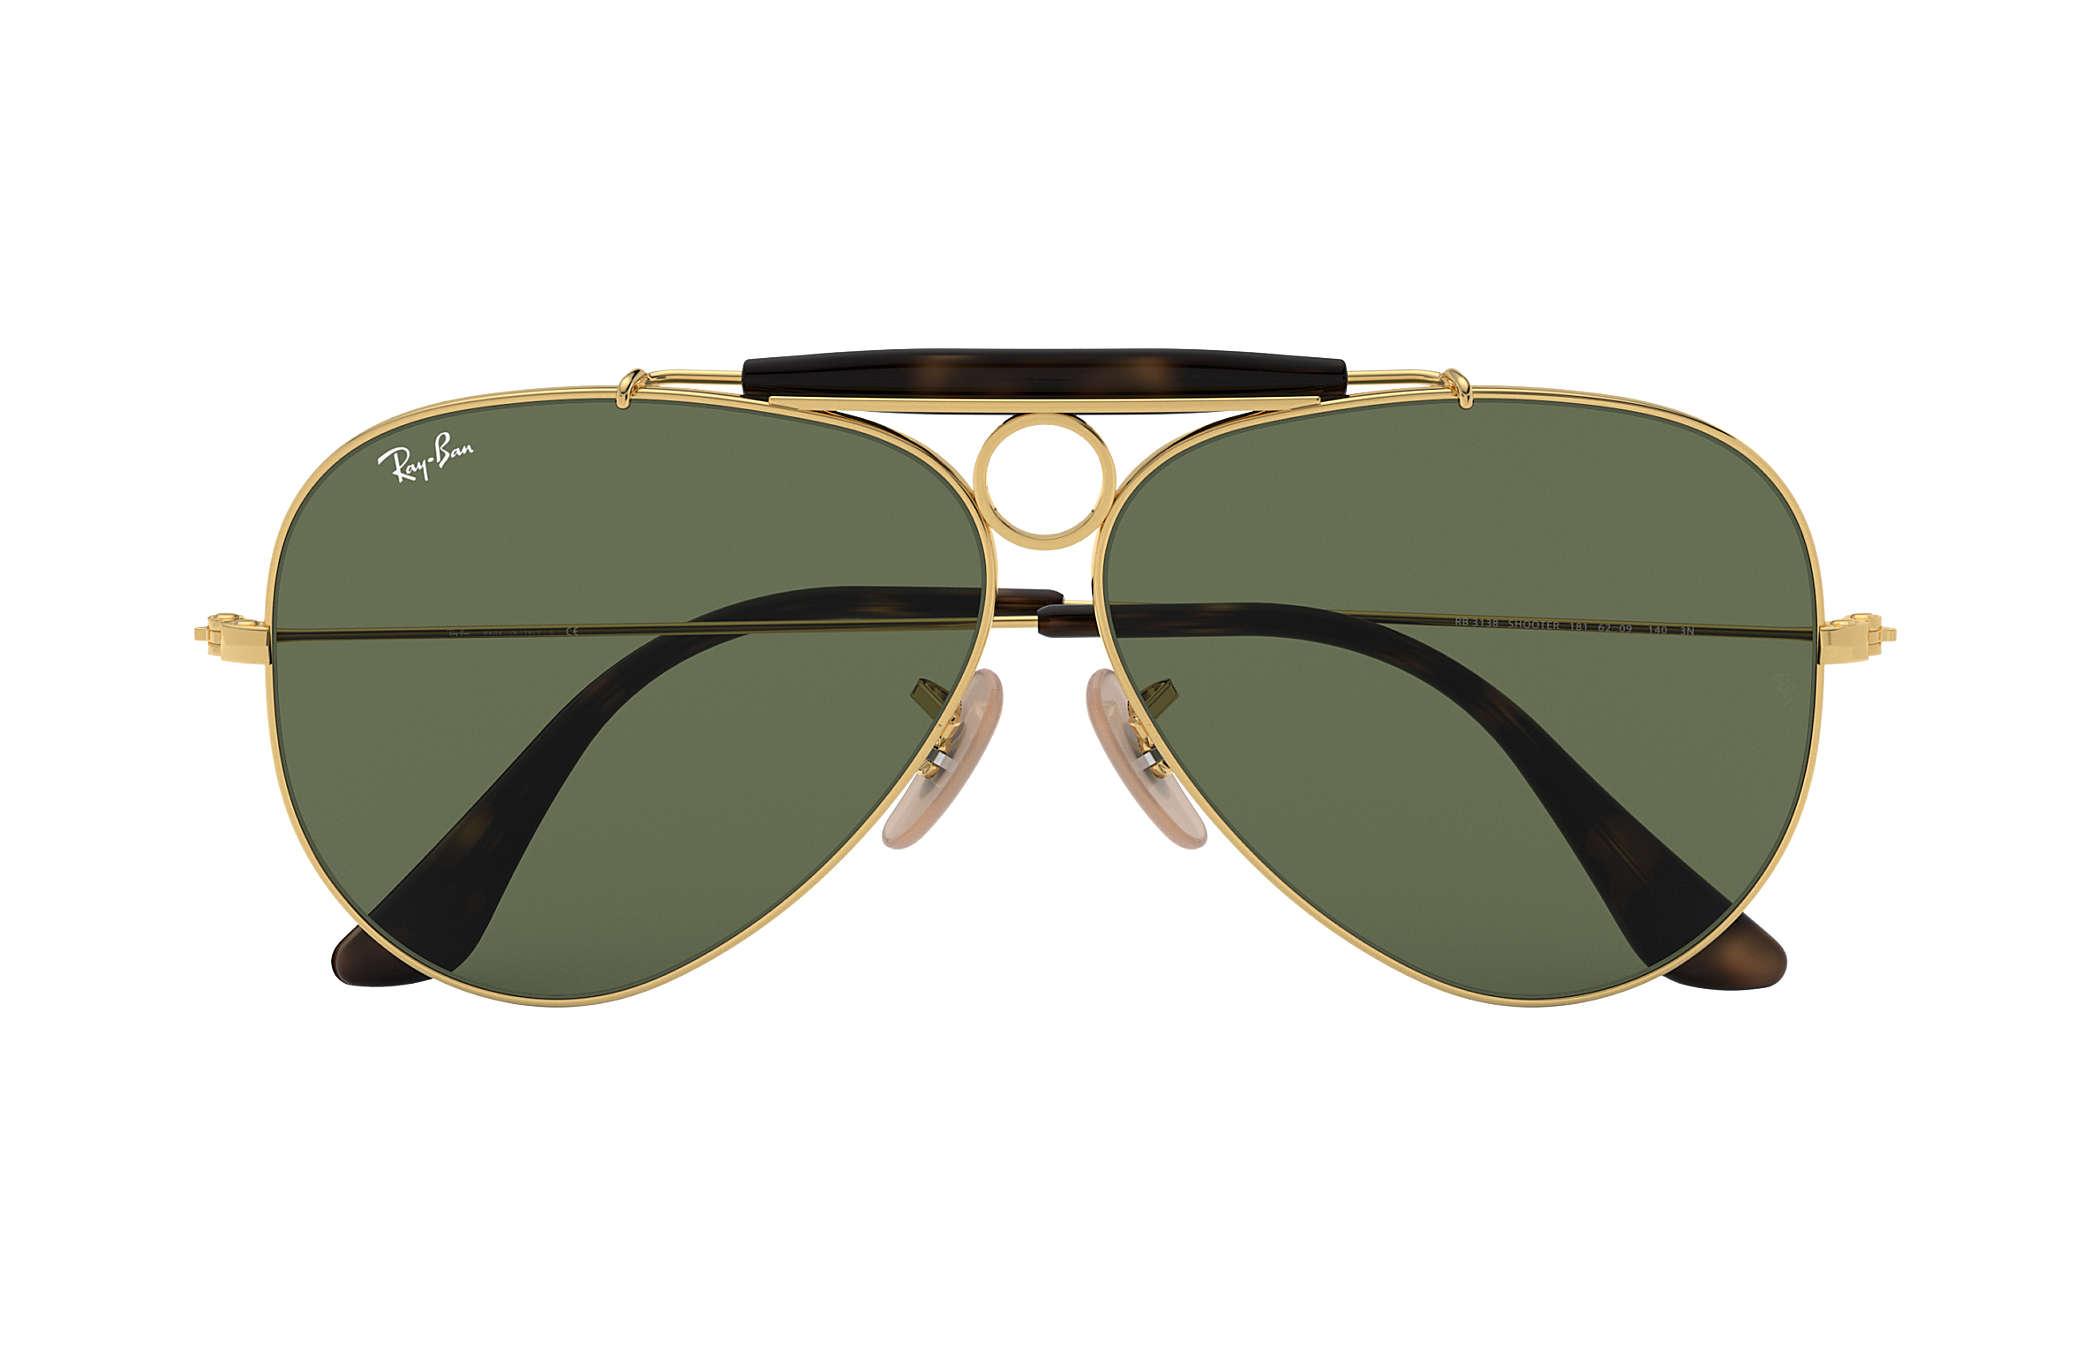 RAY BAN RAY-BAN Herren Sonnenbrille »SHOOTER RB3138«, goldfarben, 181 - gold/grün